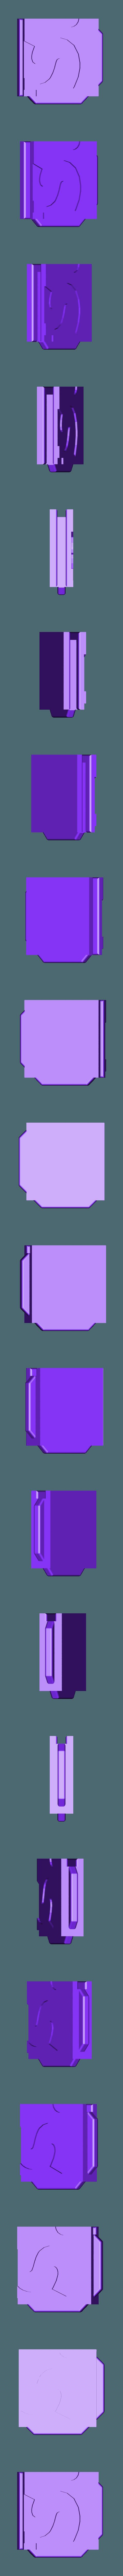 Piece - Part 22.stl Download free STL file Taquin CULTS / Sliding Puzzle • 3D print model, Valelab3D